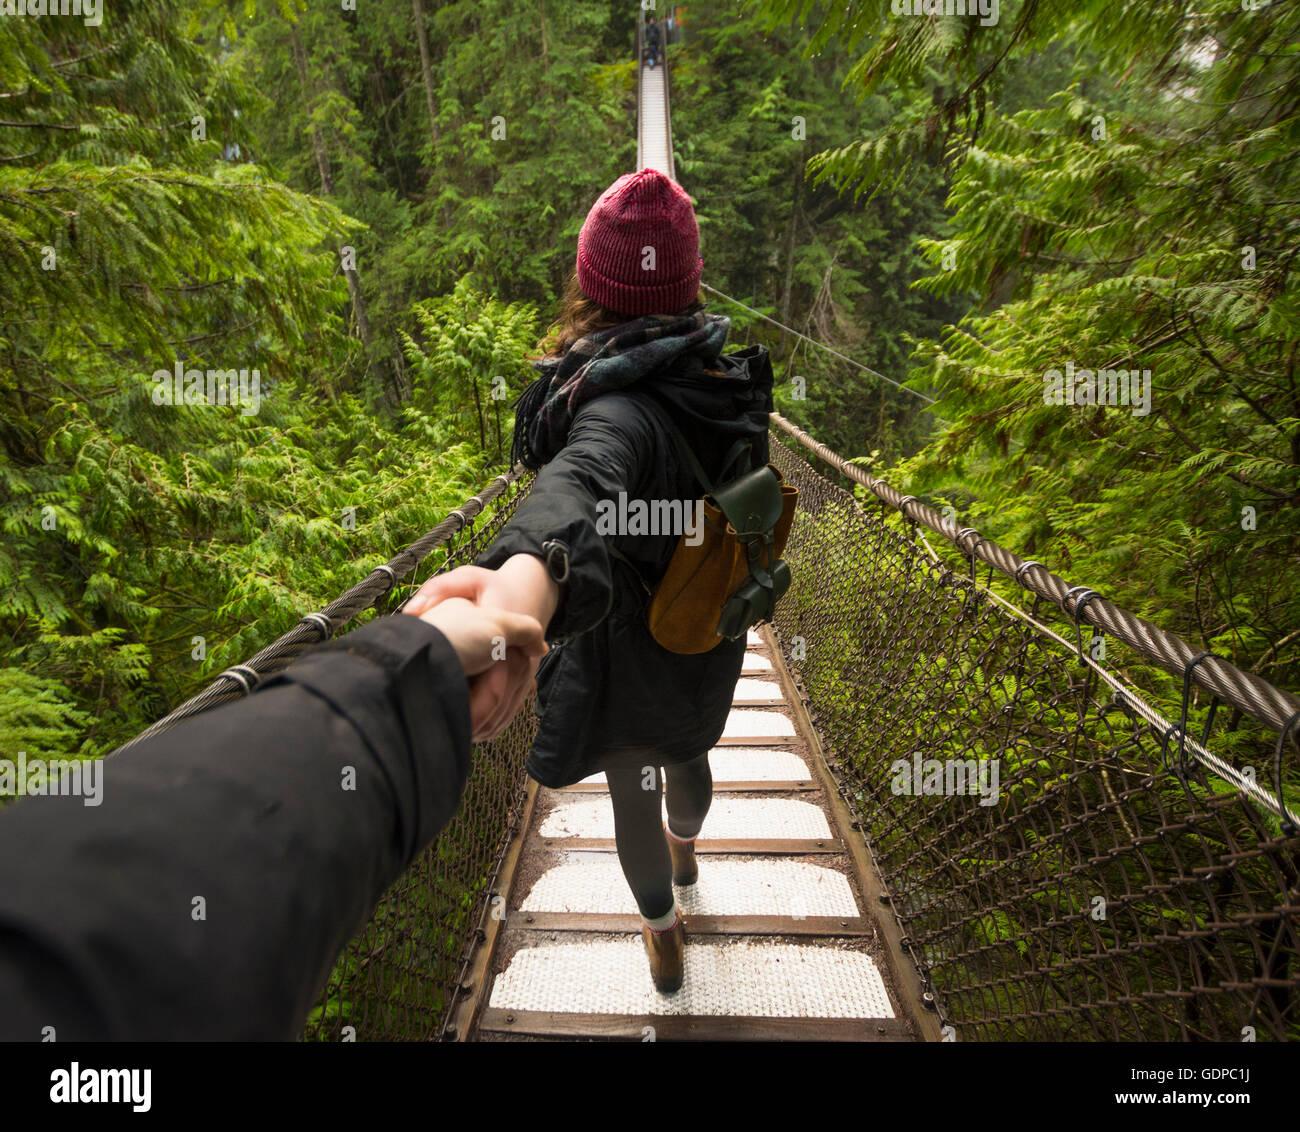 Woman on Lynn canyon suspension bridge holding mans hand, North Vancouver, British Columbia, Canada - Stock Image